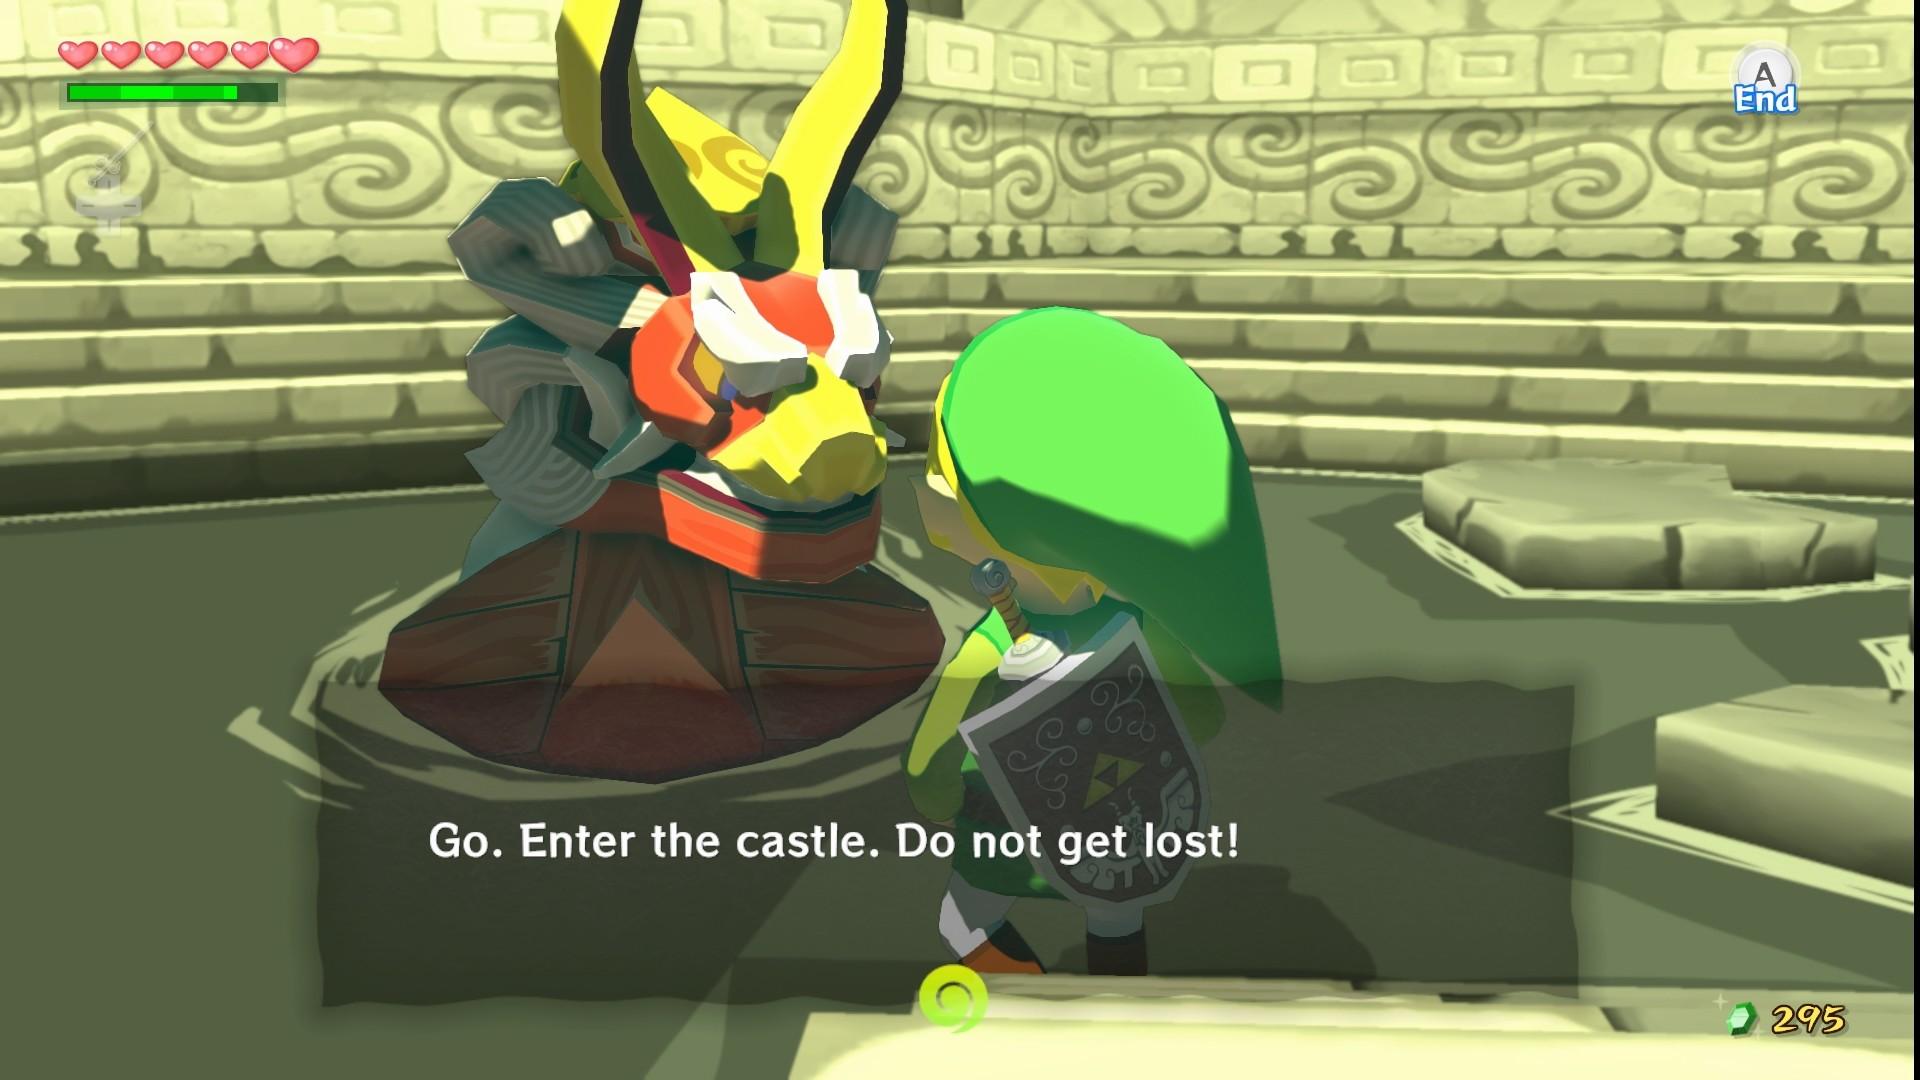 The Legend of Zelda: The Wind Waker HD screenshots show gameplay, Miiverse